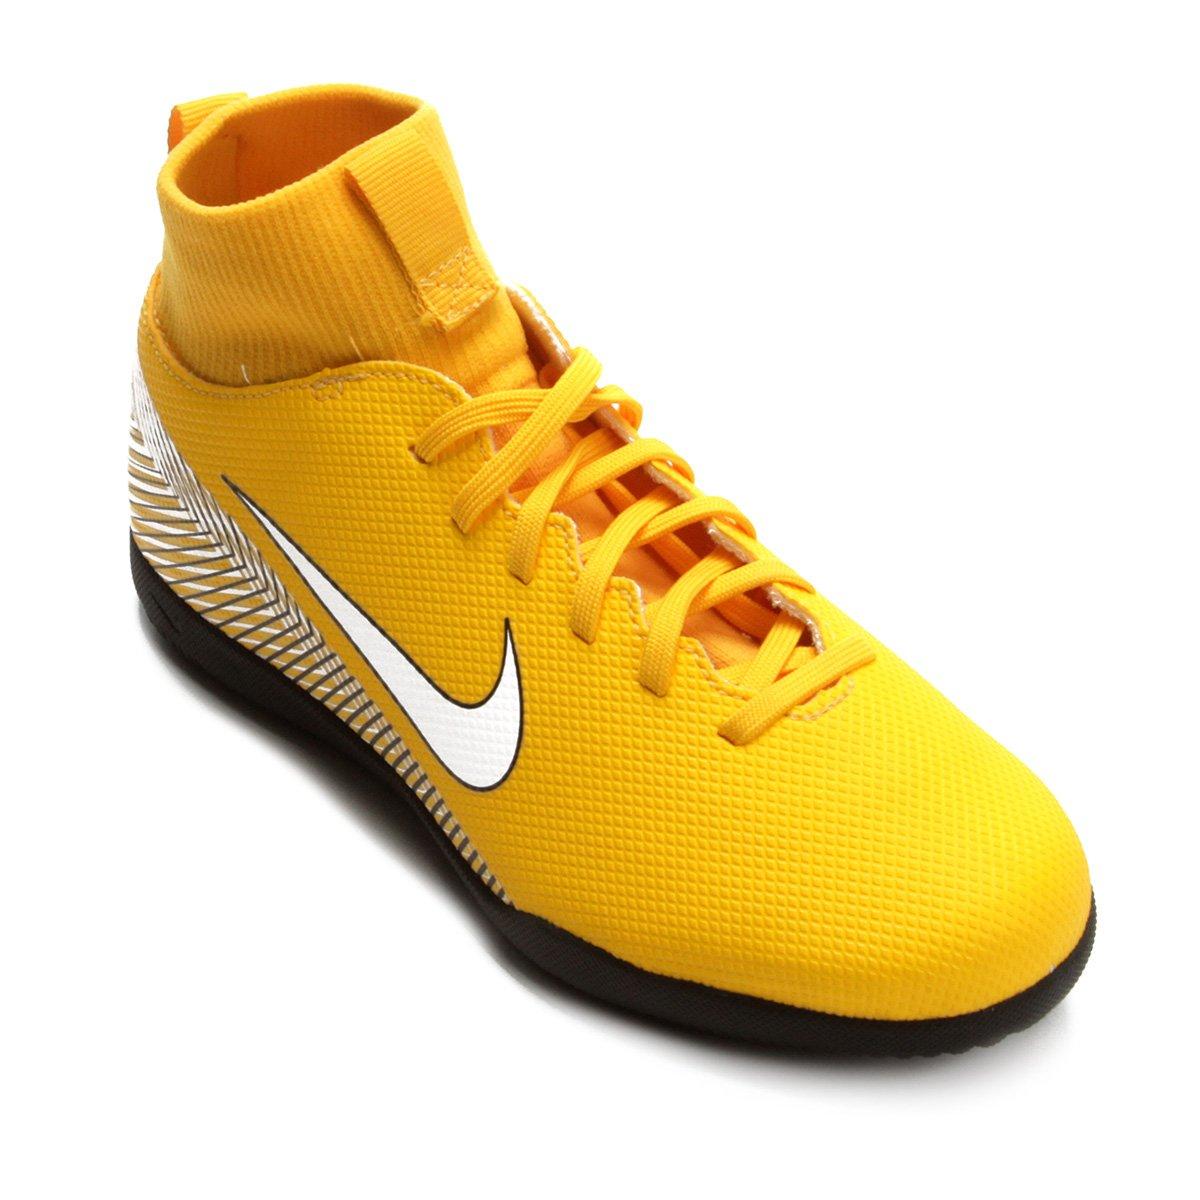 668ae5315 Chuteira Futsal Infantil Nike Mercurial Superfly 6 Club Neymar IC - Compre  Agora